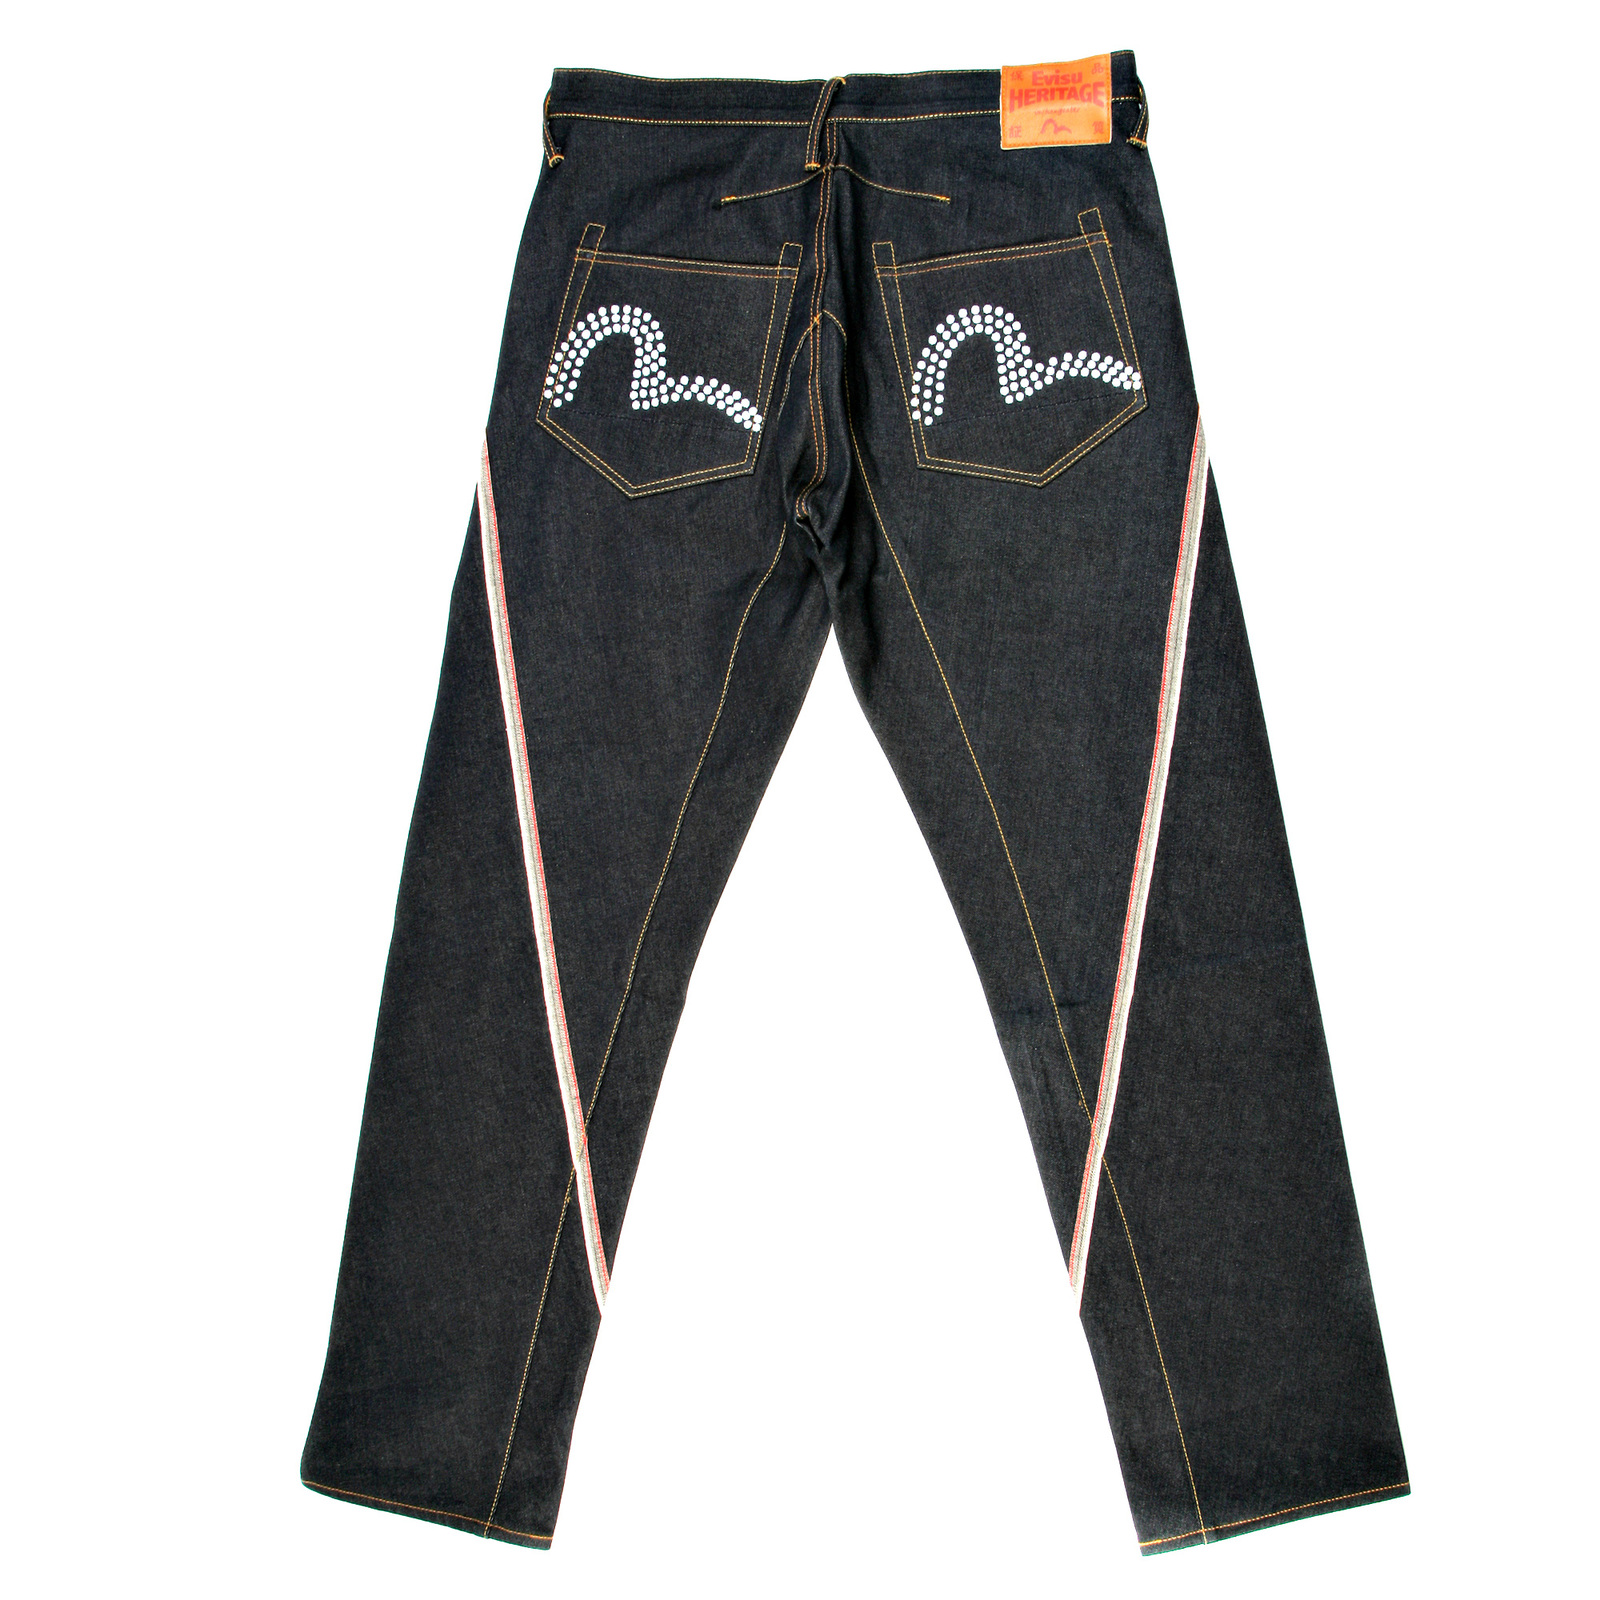 Evisu embroidered pocket jeans togged